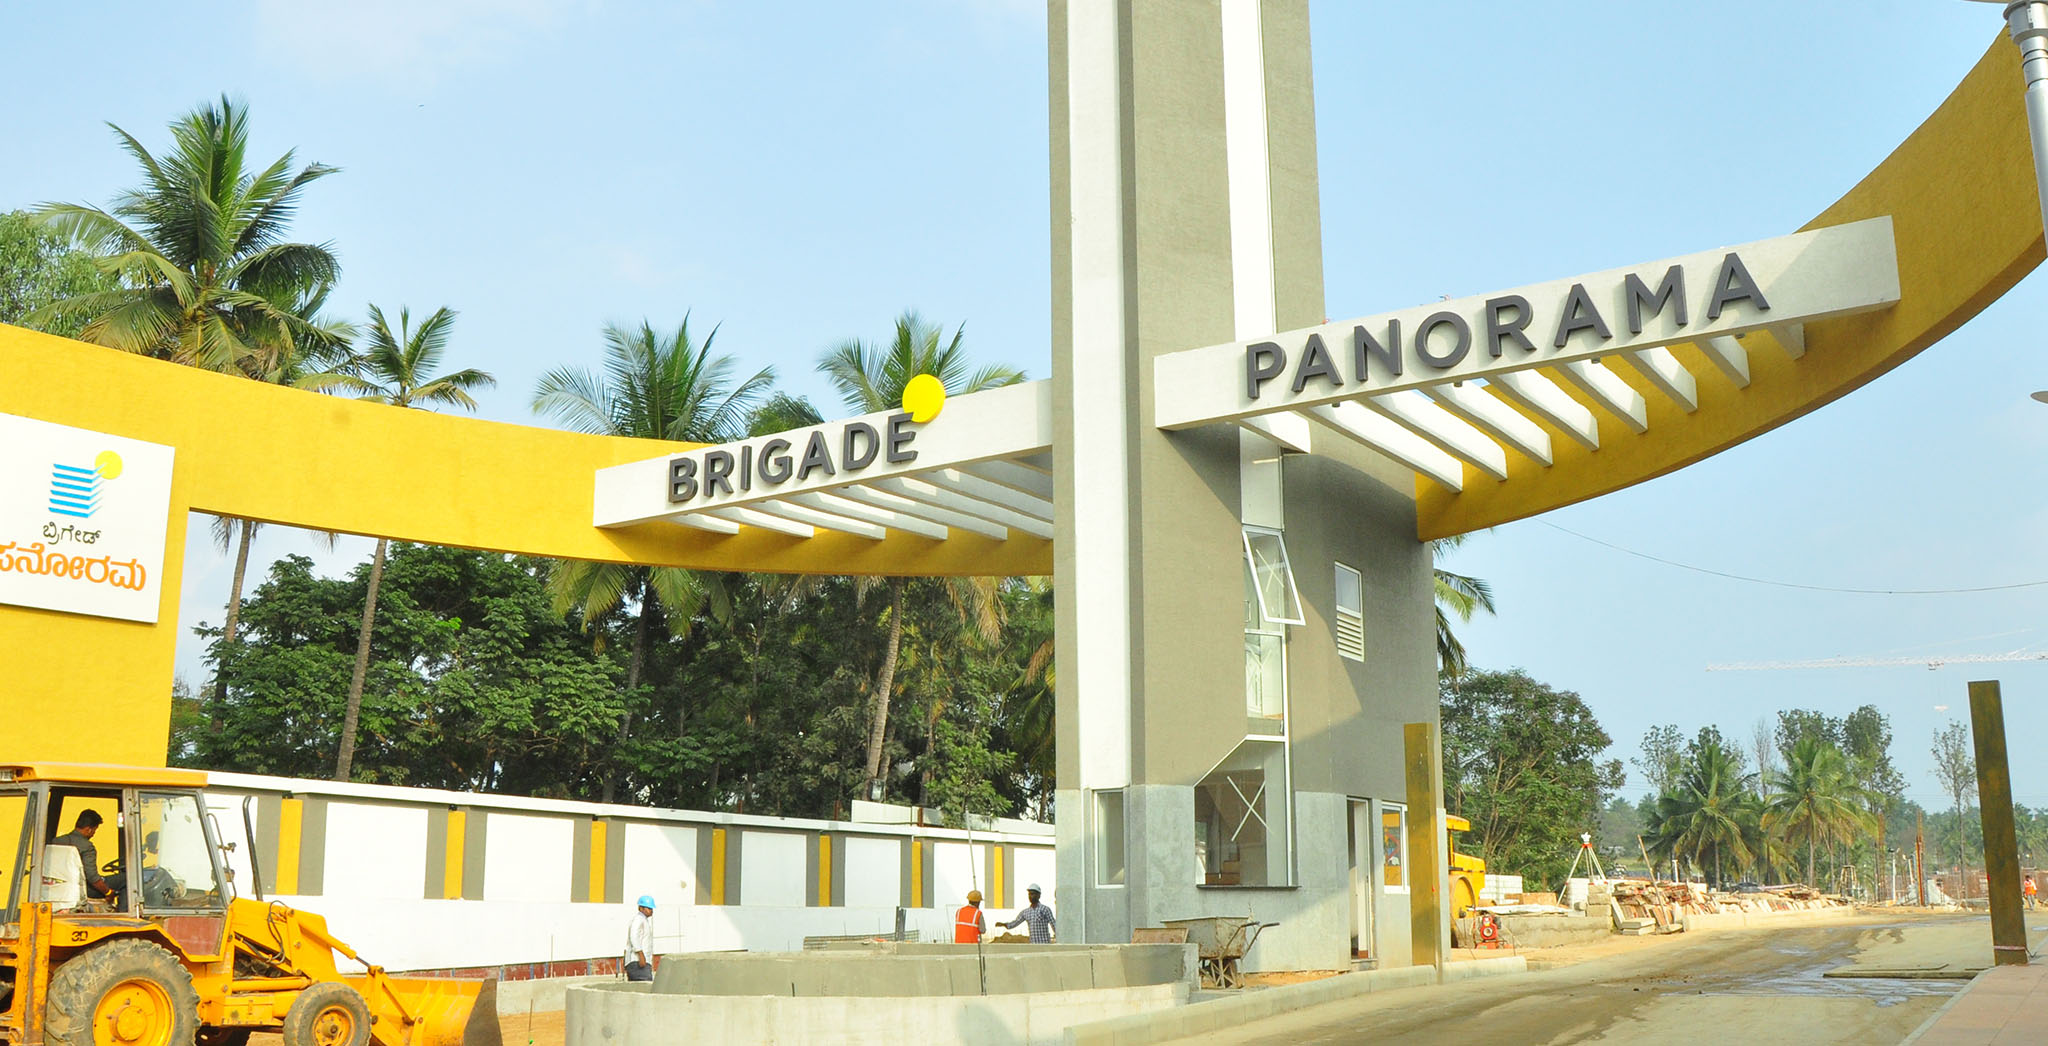 Brigade Panorama - Apartments in Bangalore | Residential ...